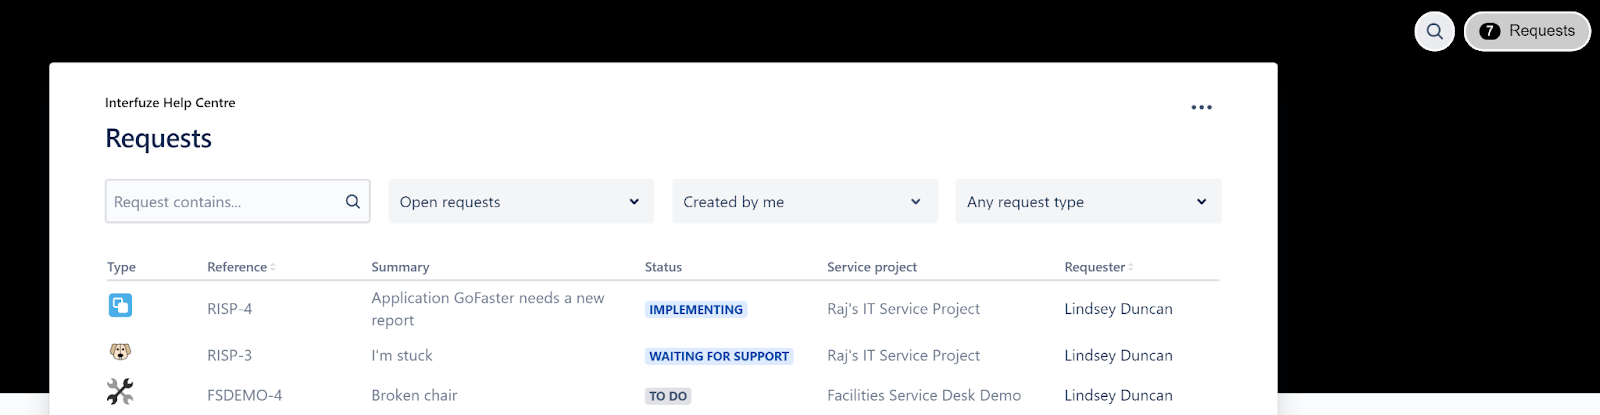 Jira Service Management Customer Request